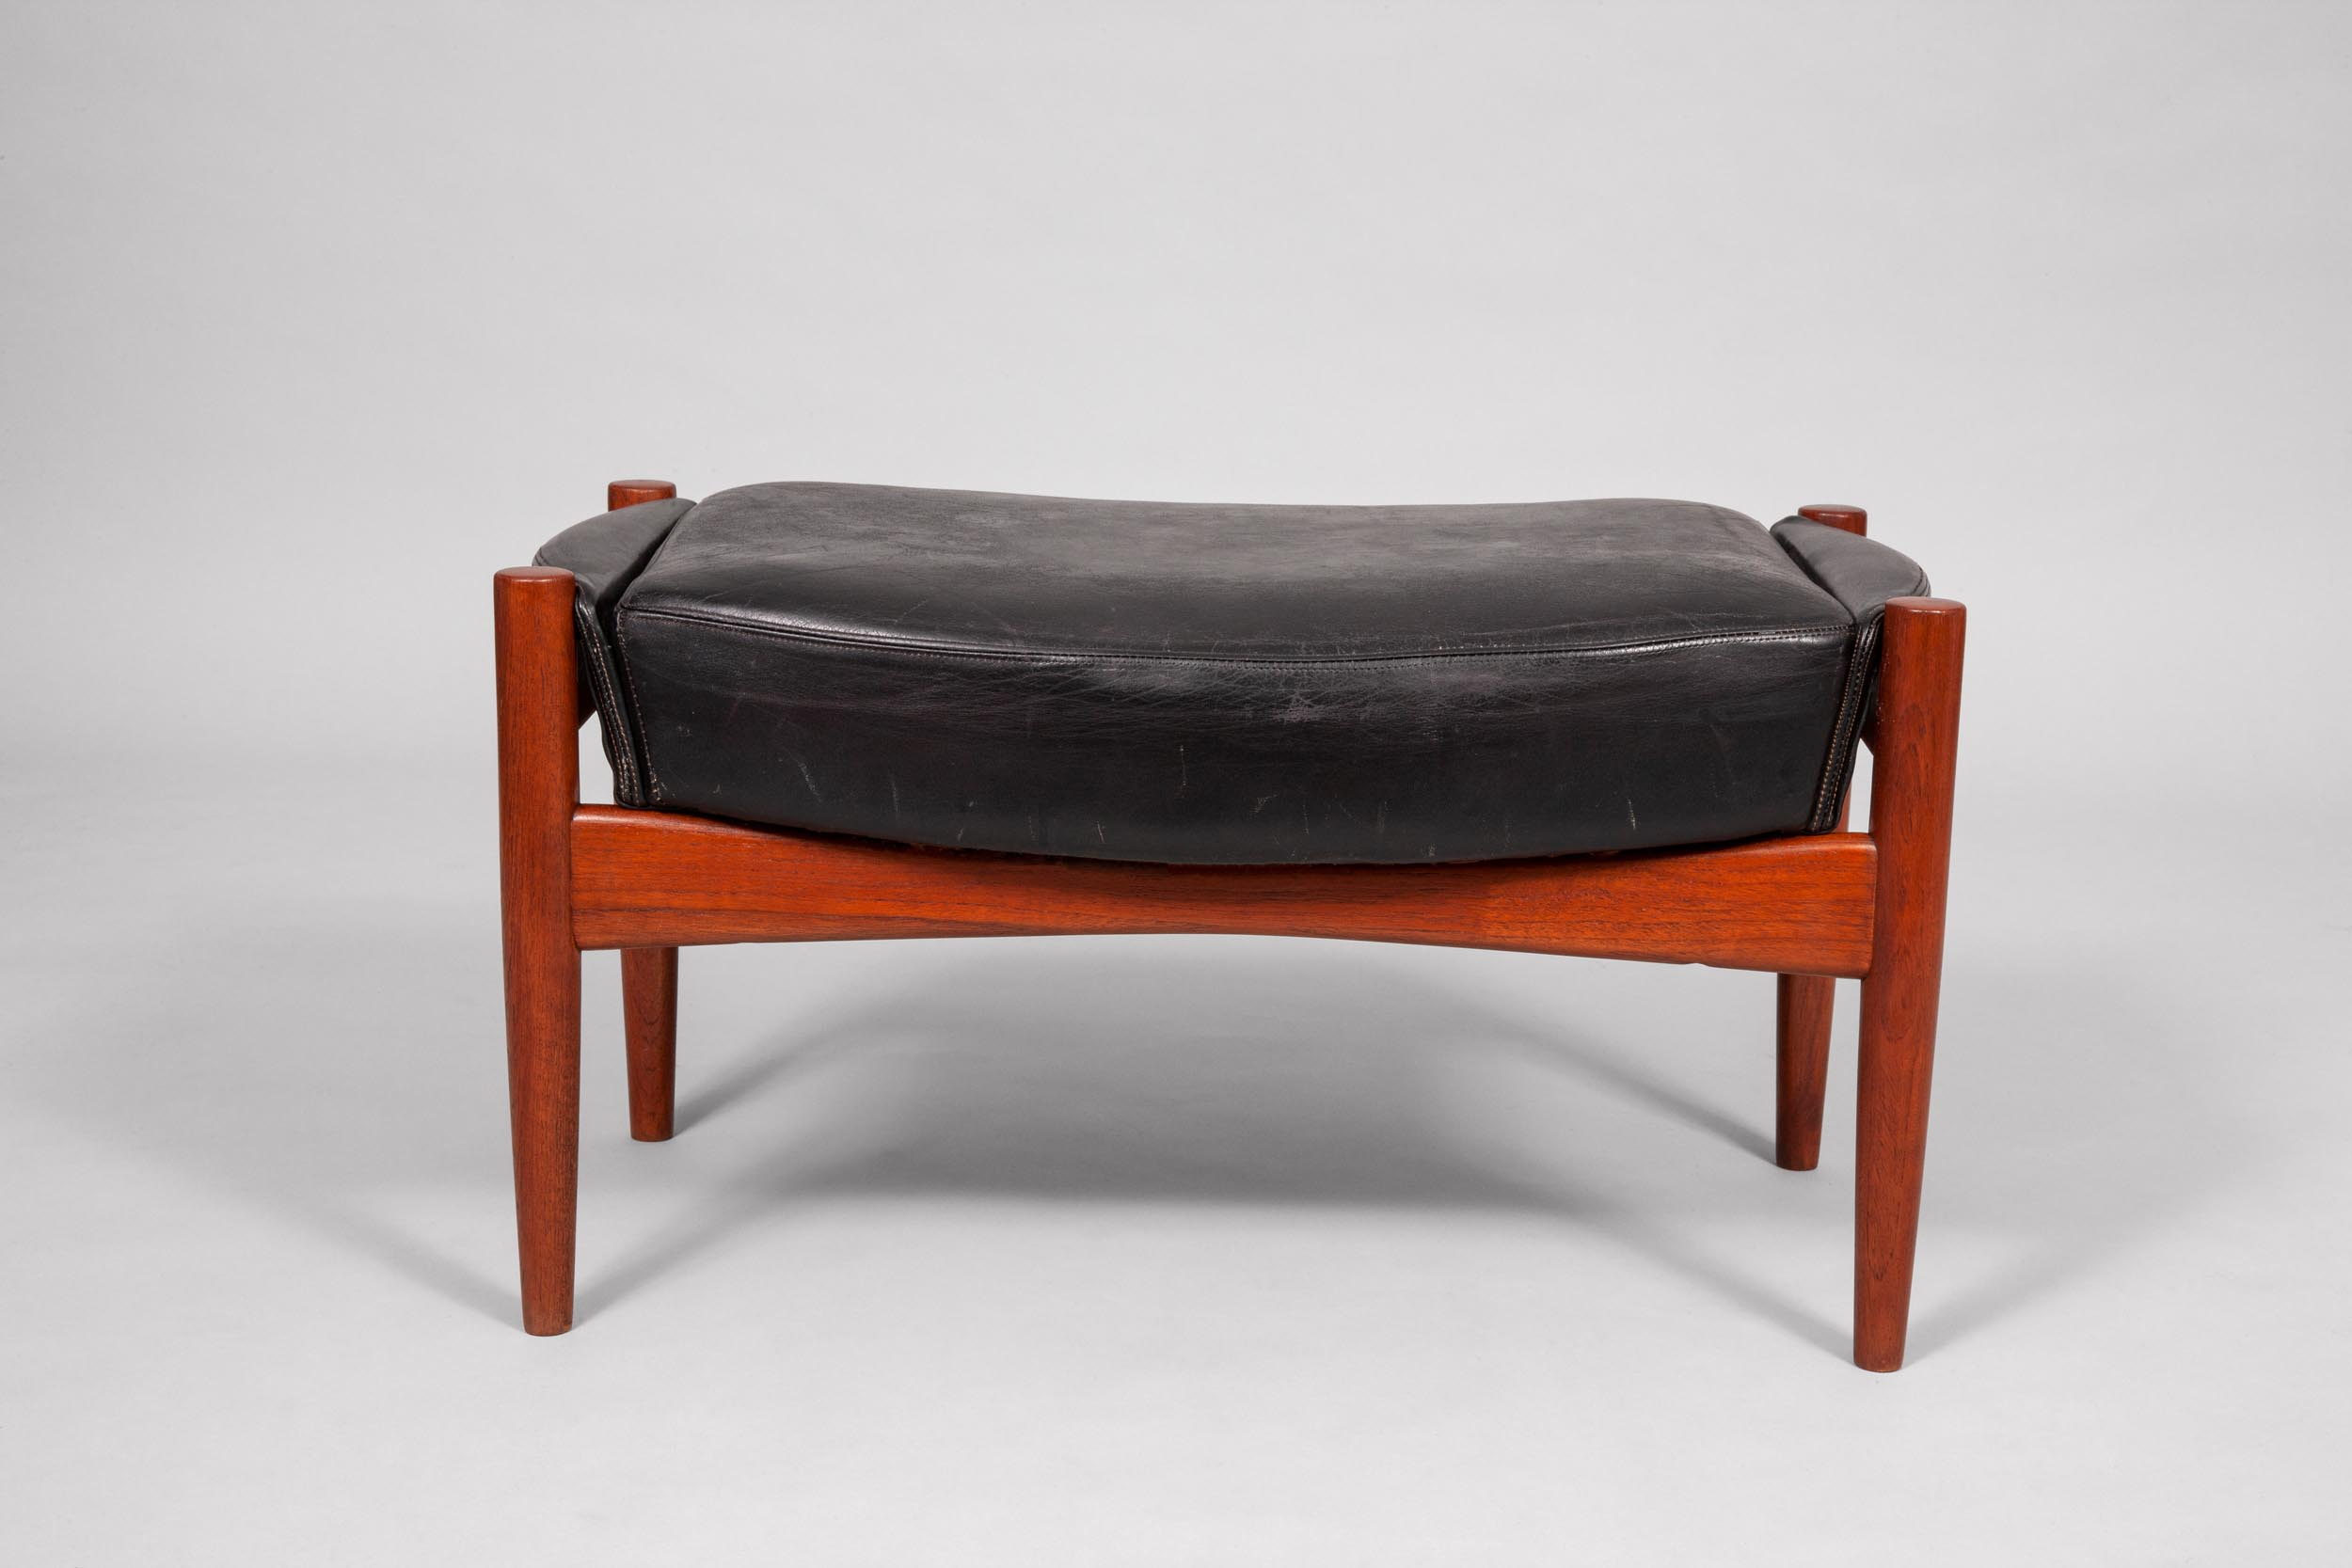 IB Kofod Larsen, chair and stool, Denmark/Sweden, 1955